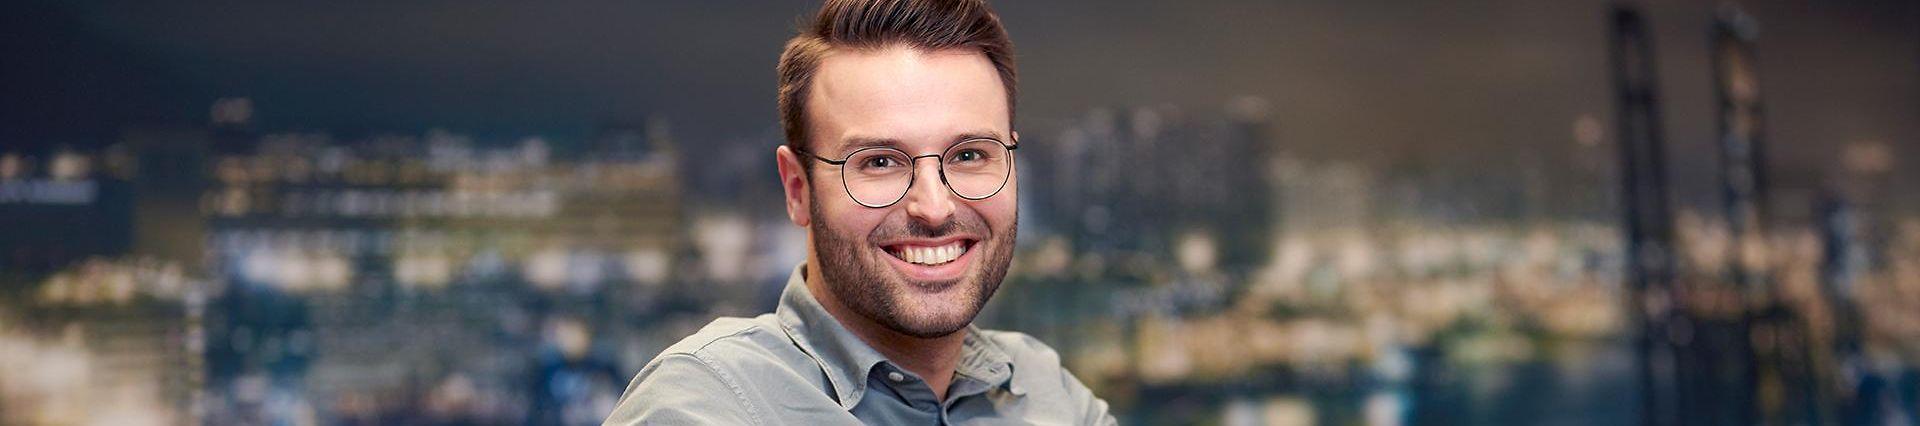 DB_Schenker_BeneLux_42_ProfessionalWhiteCollar_Male